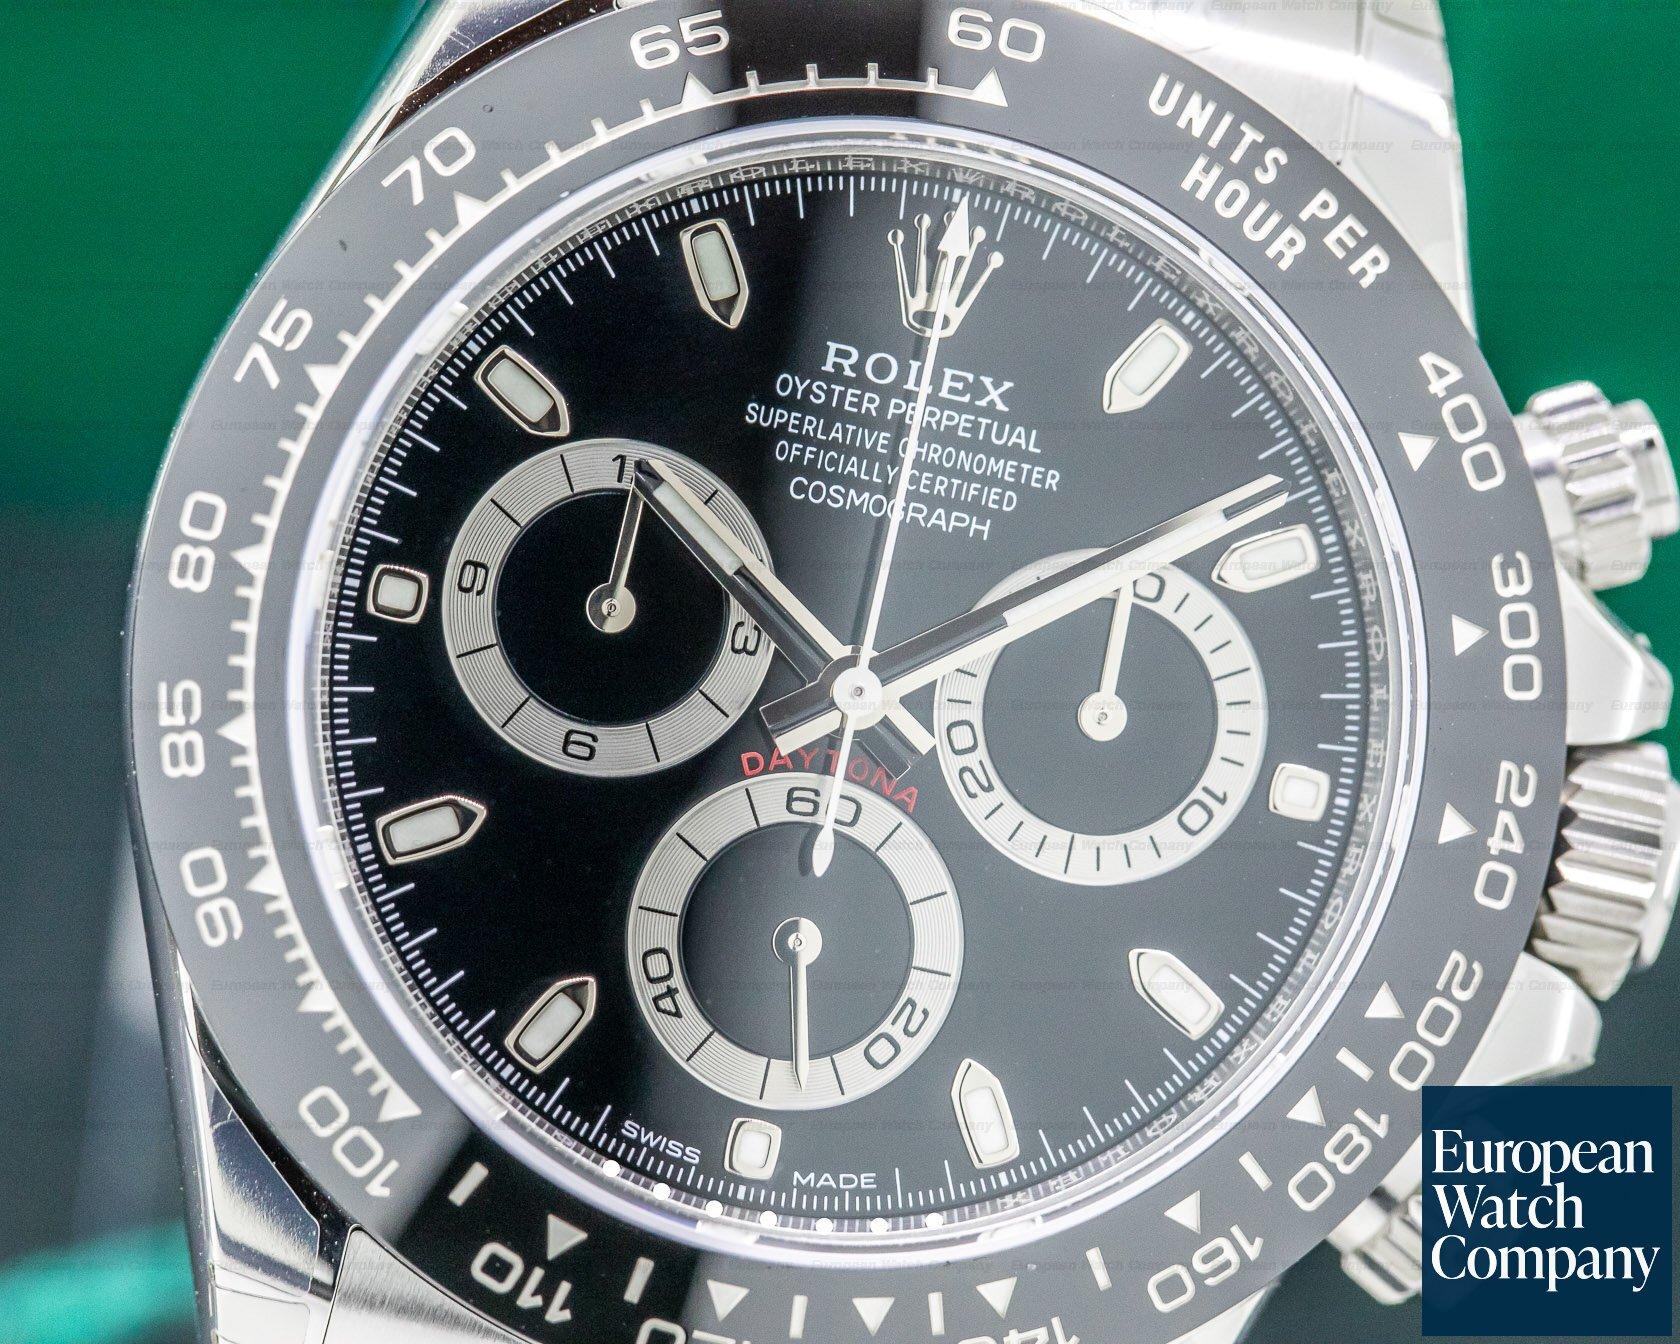 Rolex 116500LN Daytona Ceramic Bezel SS / Black Dial UNWORN STICKERS